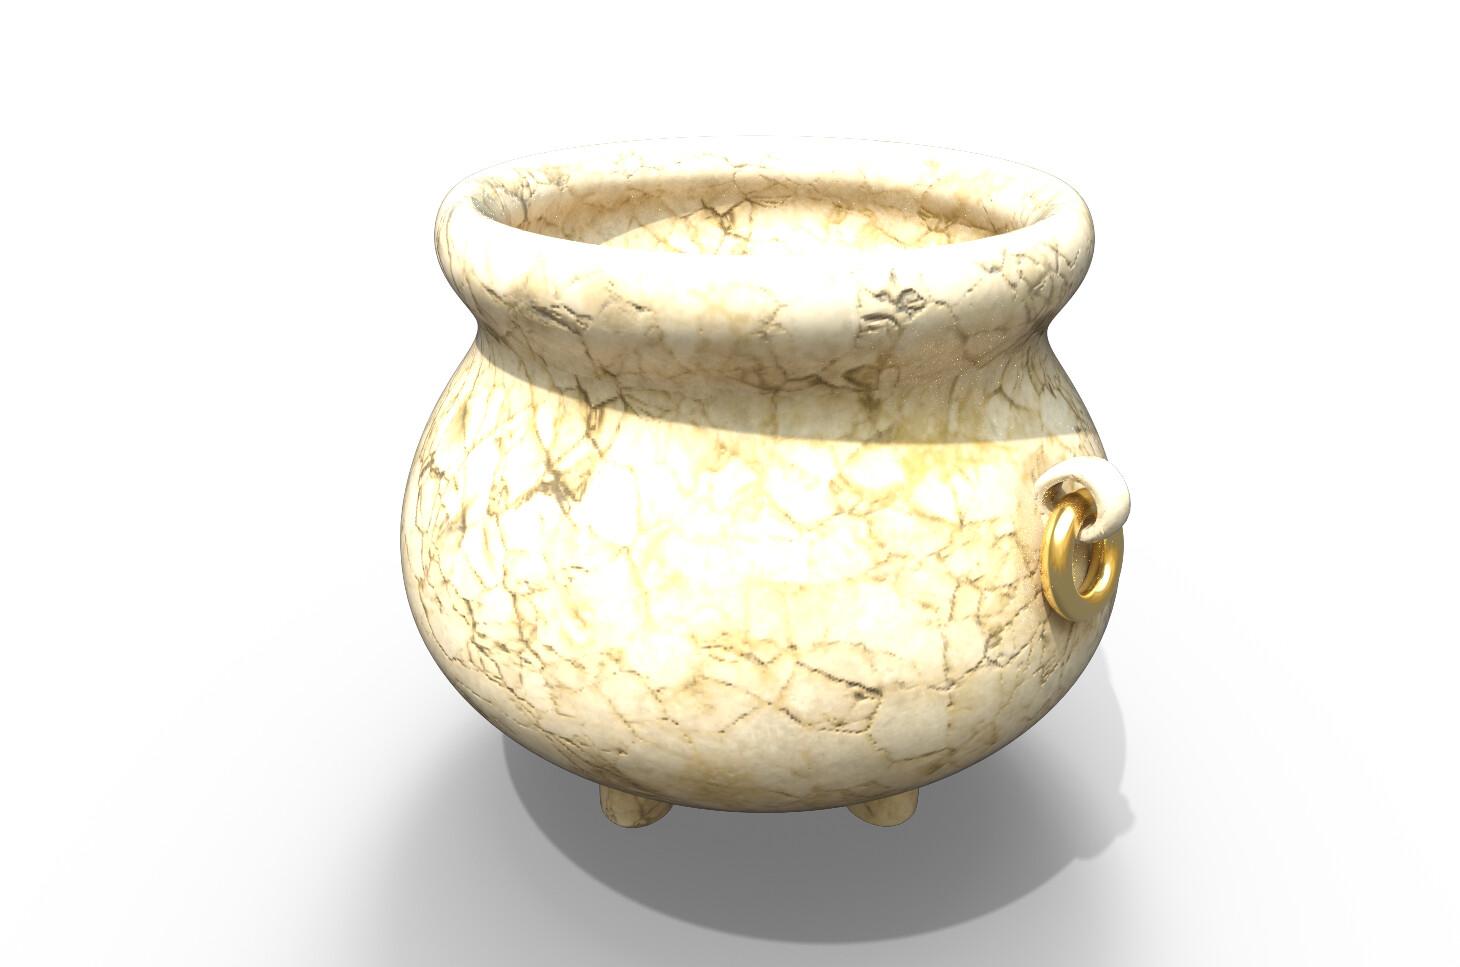 Joseph moniz cauldron001h